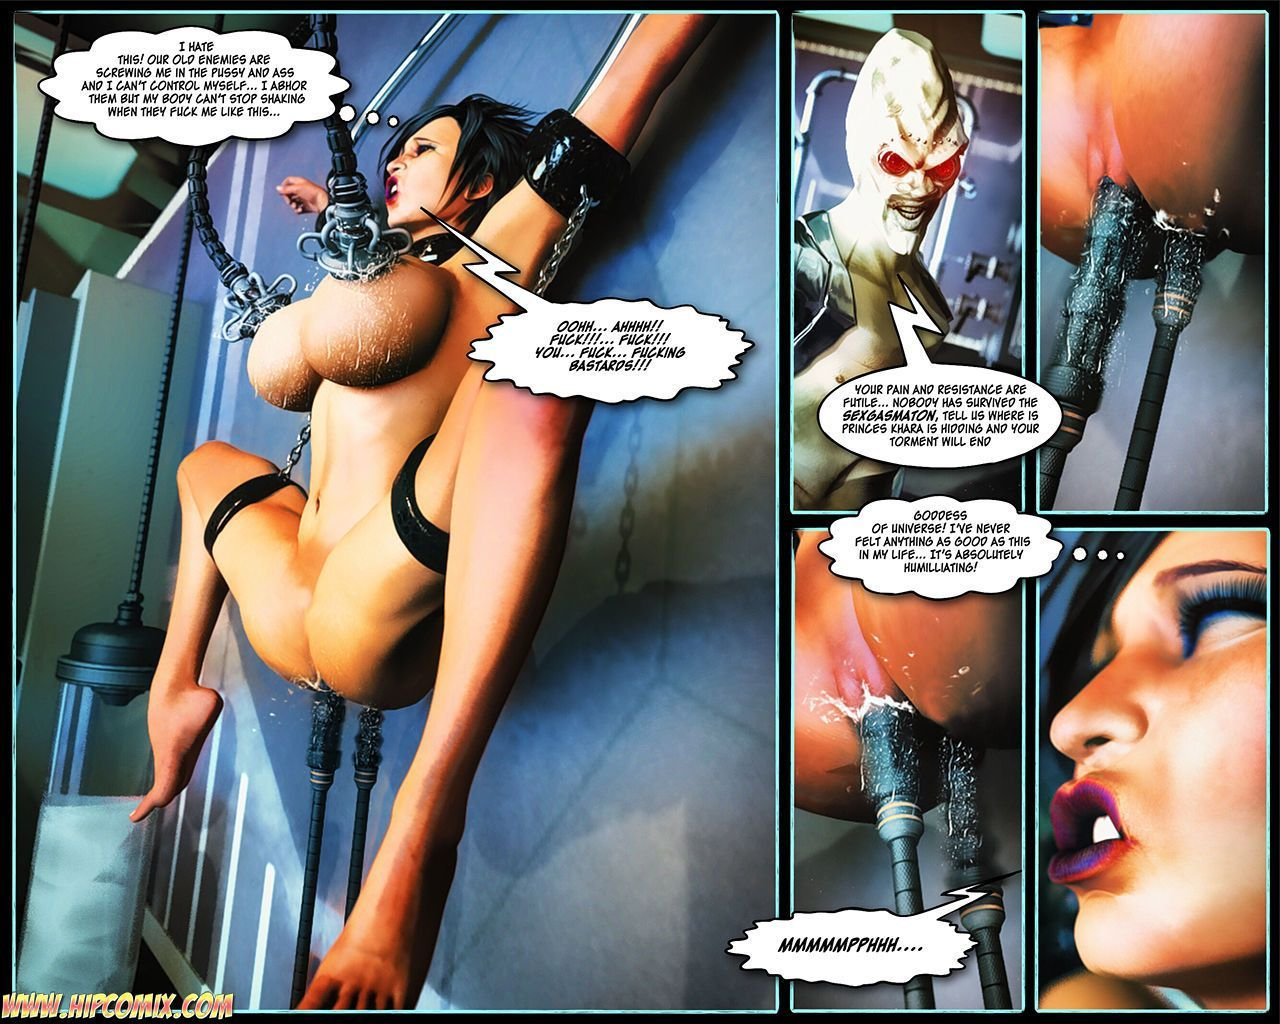 [Mitru] Hip Girl - Captive of Guul 1-8 - part 7